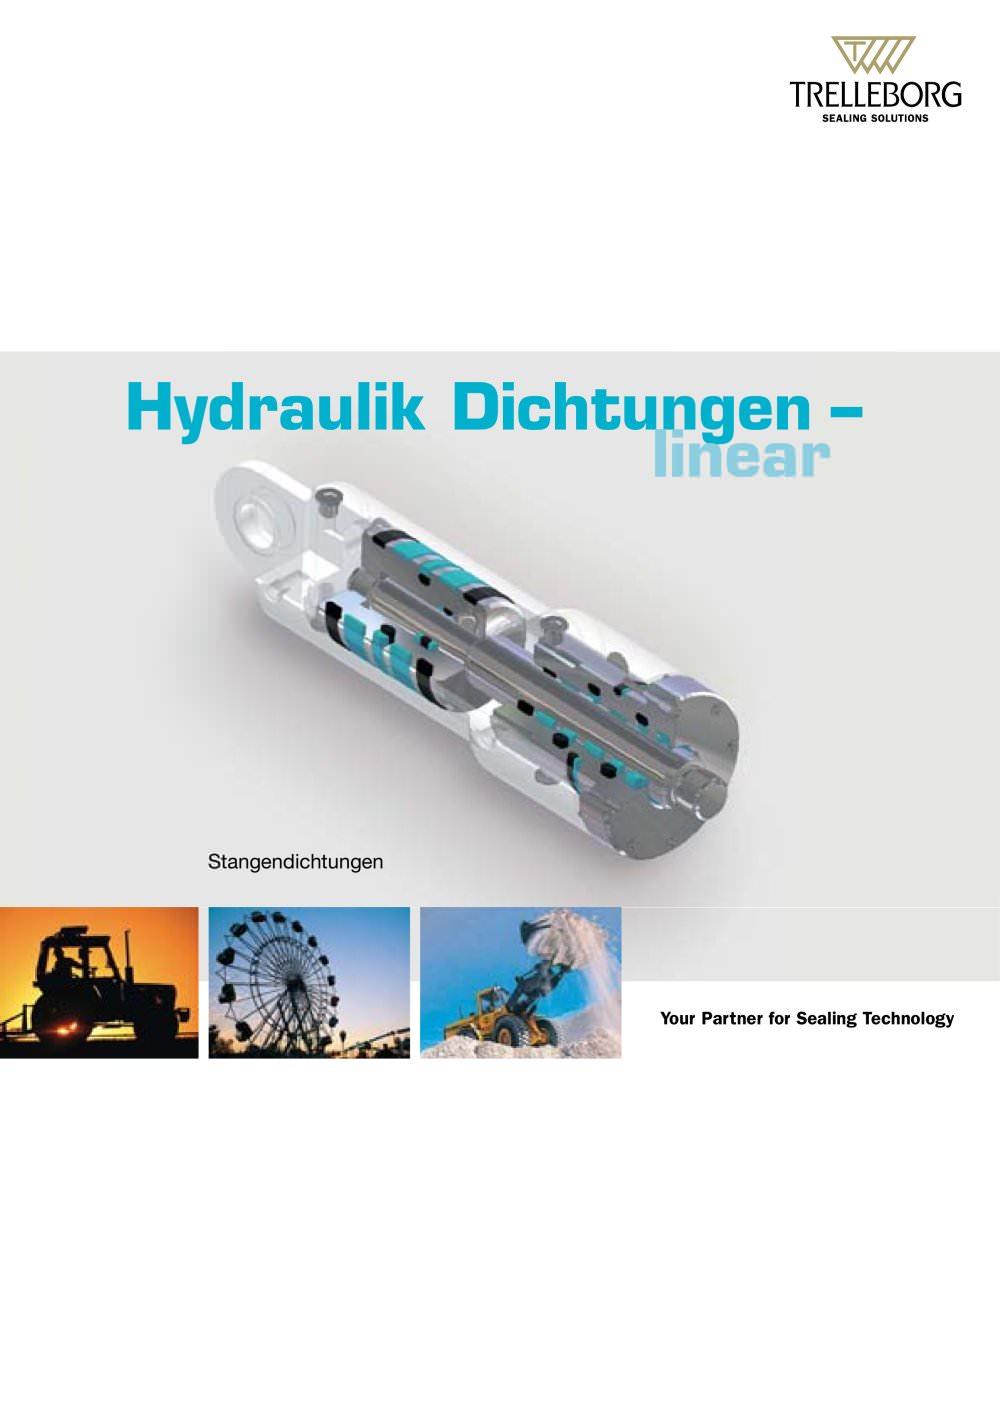 Hydraulik dichtungen katalog